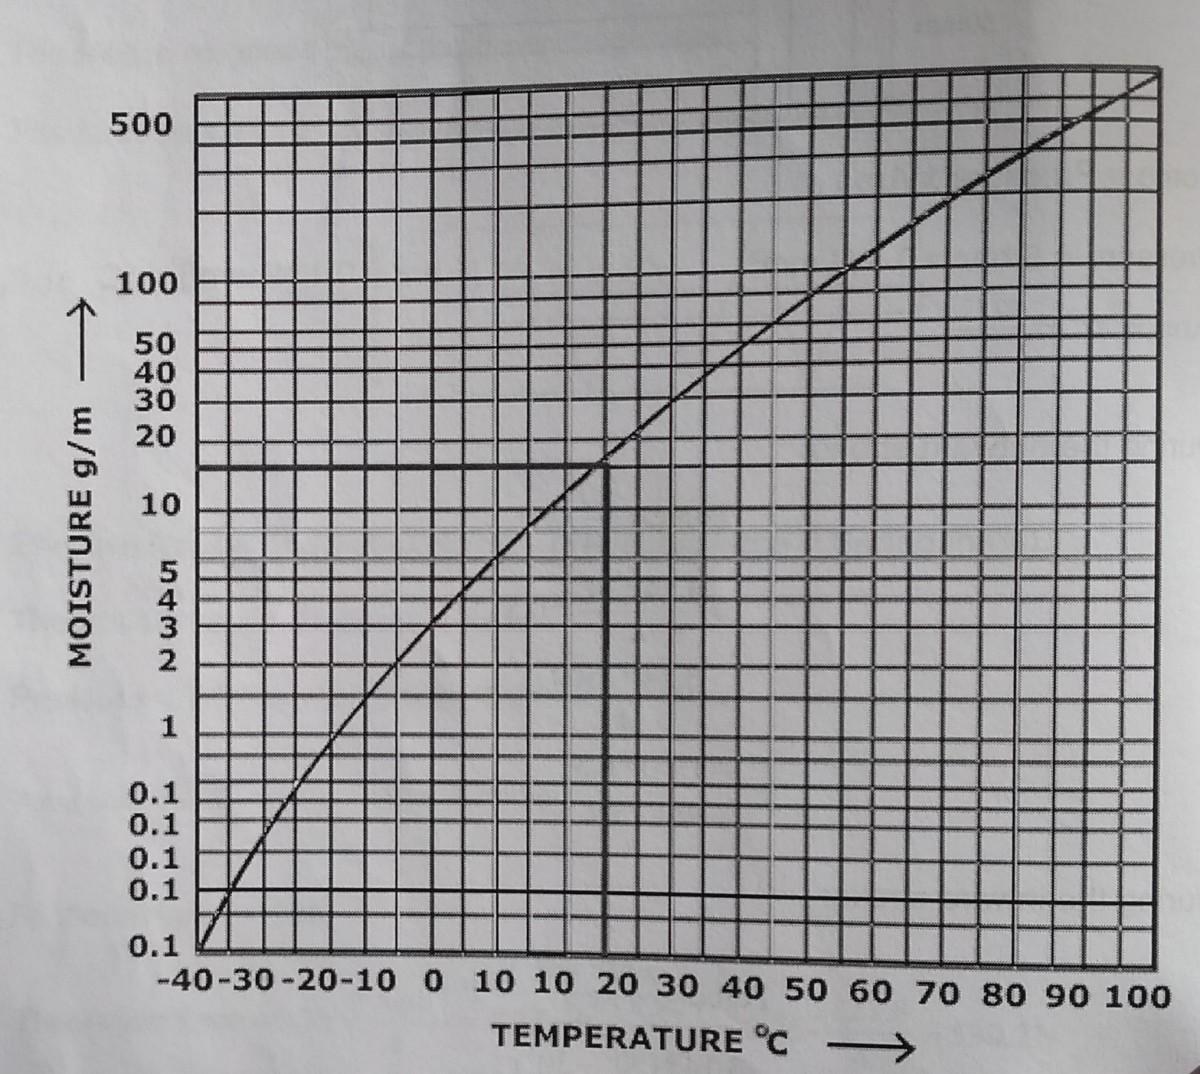 Dew point curve.